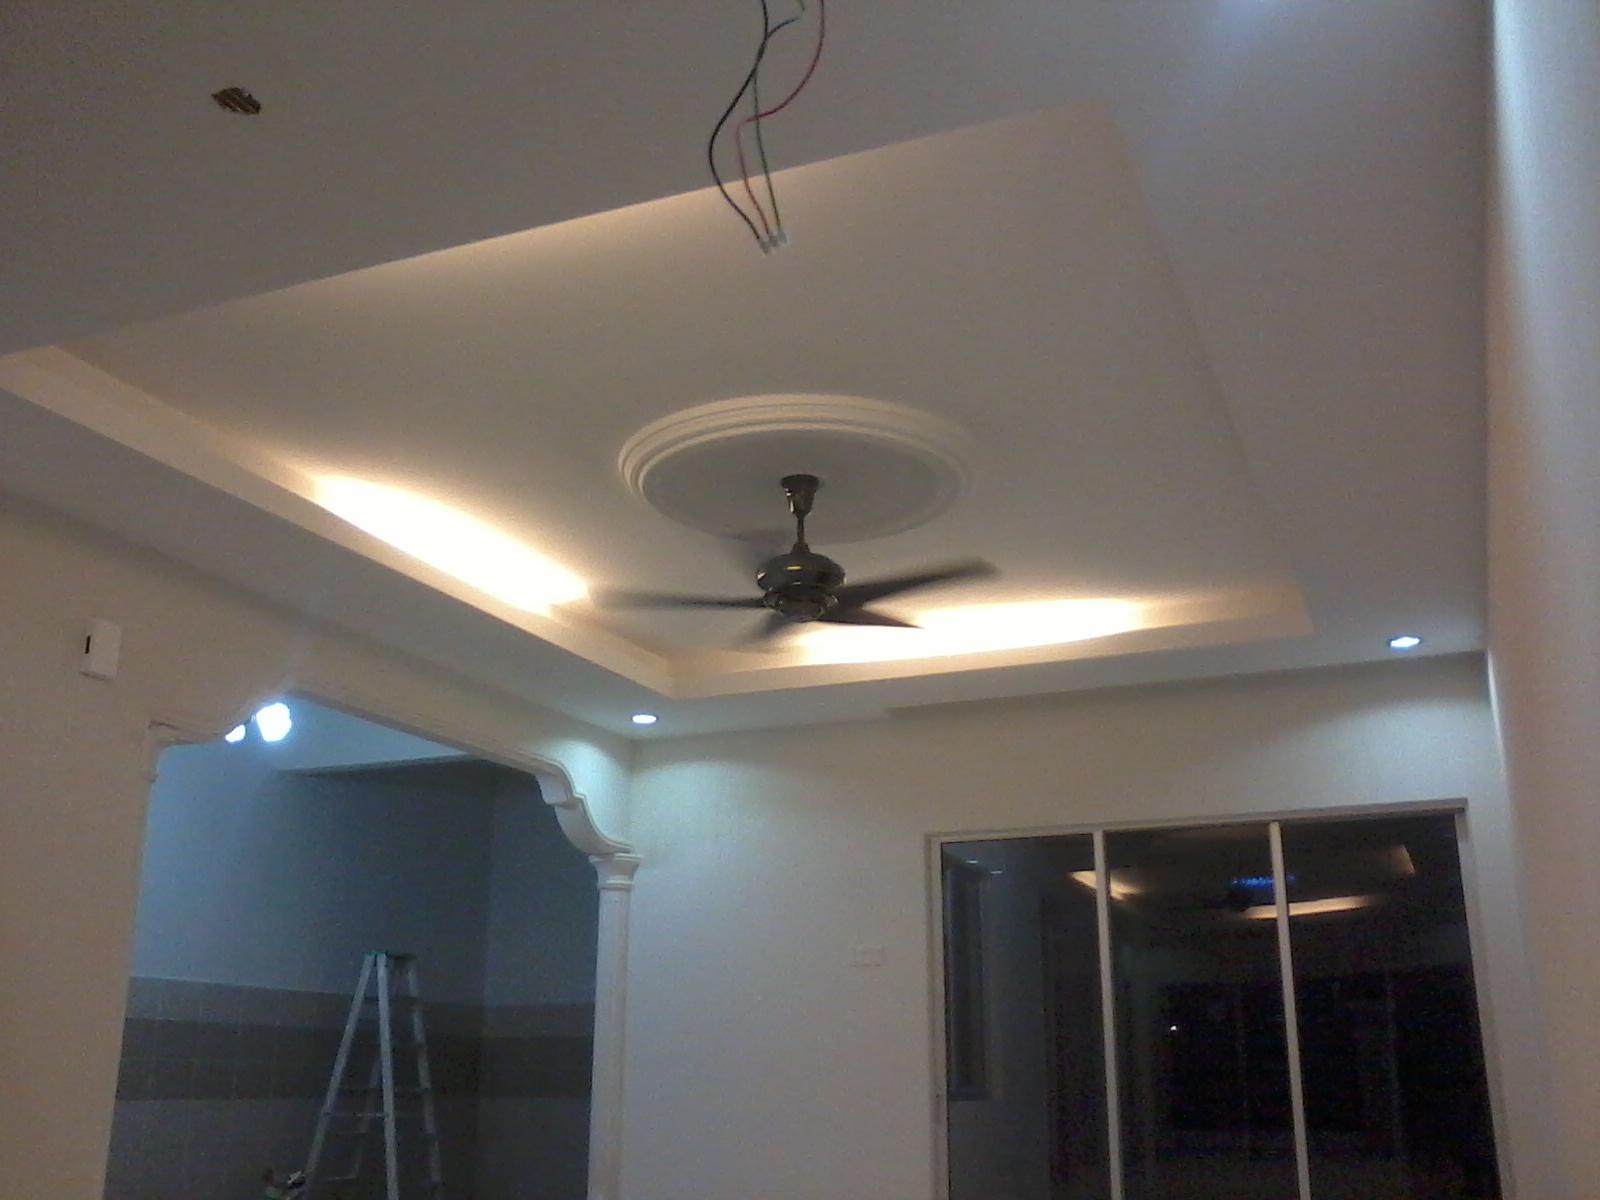 Siling Plaster Gaya Moden dan pencahayaan Ruang tamu di DENAI ALAM